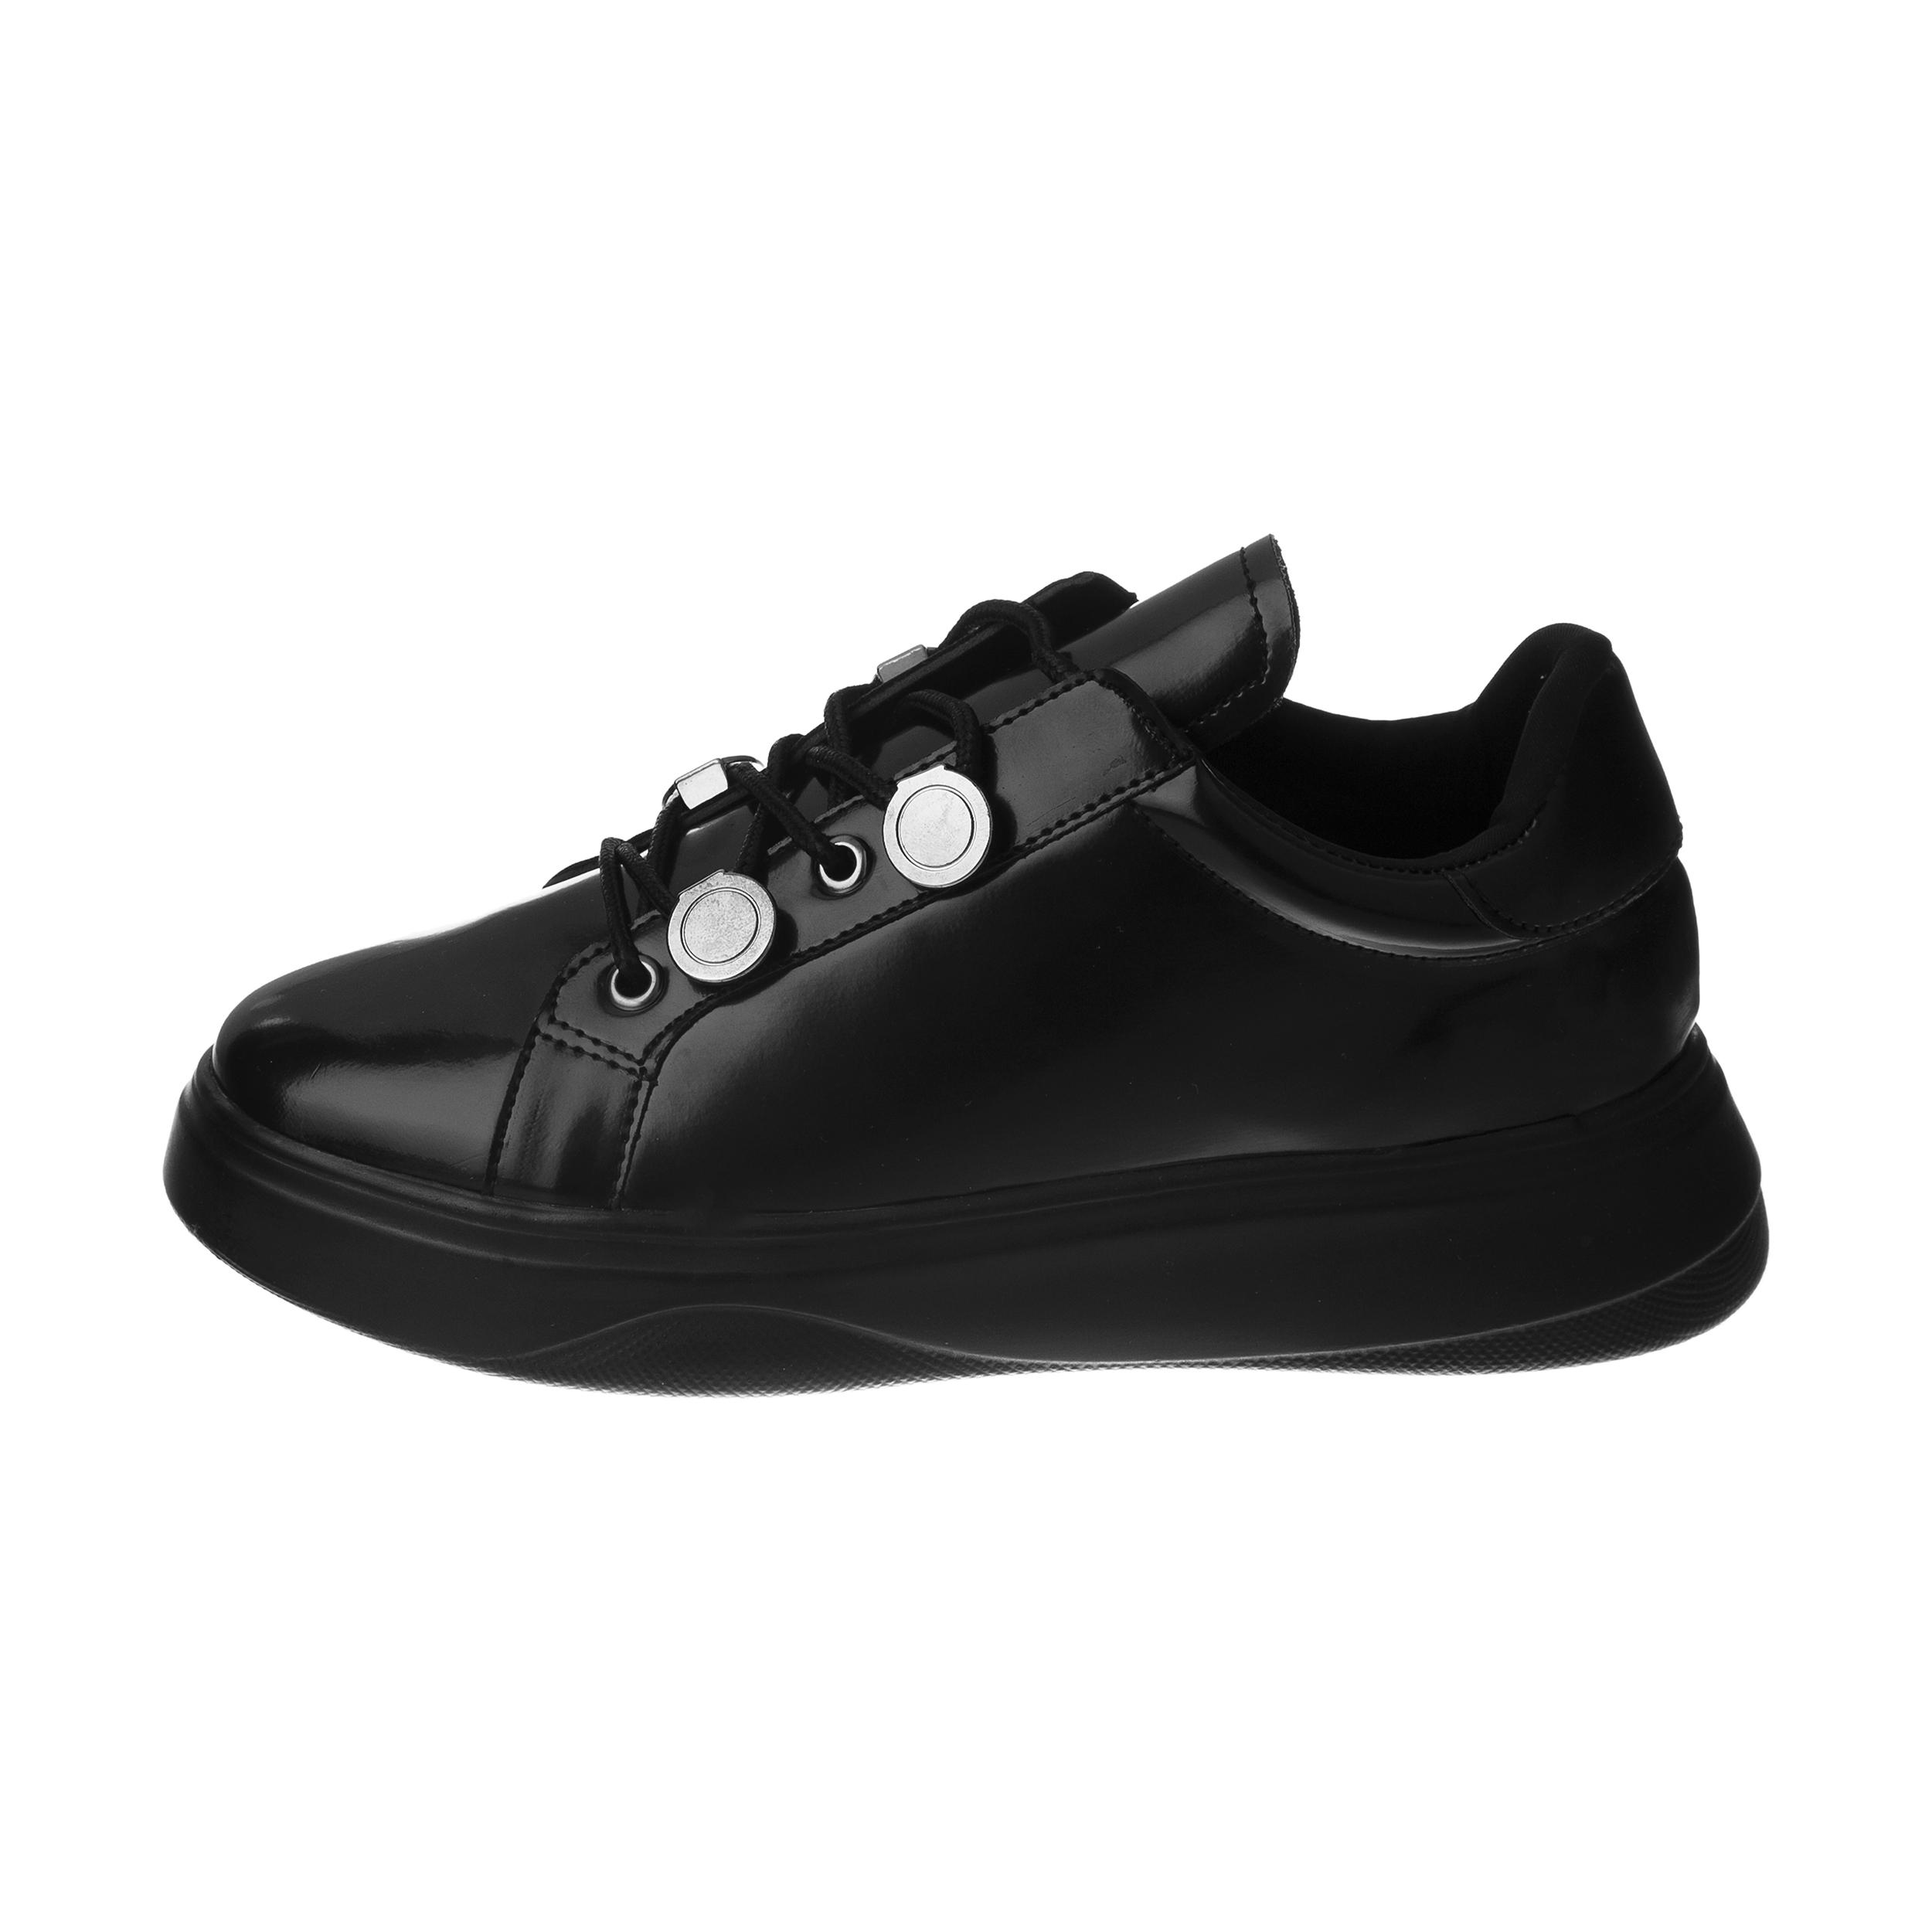 کفش روزمره زنانه ام تو مدل 1002-98